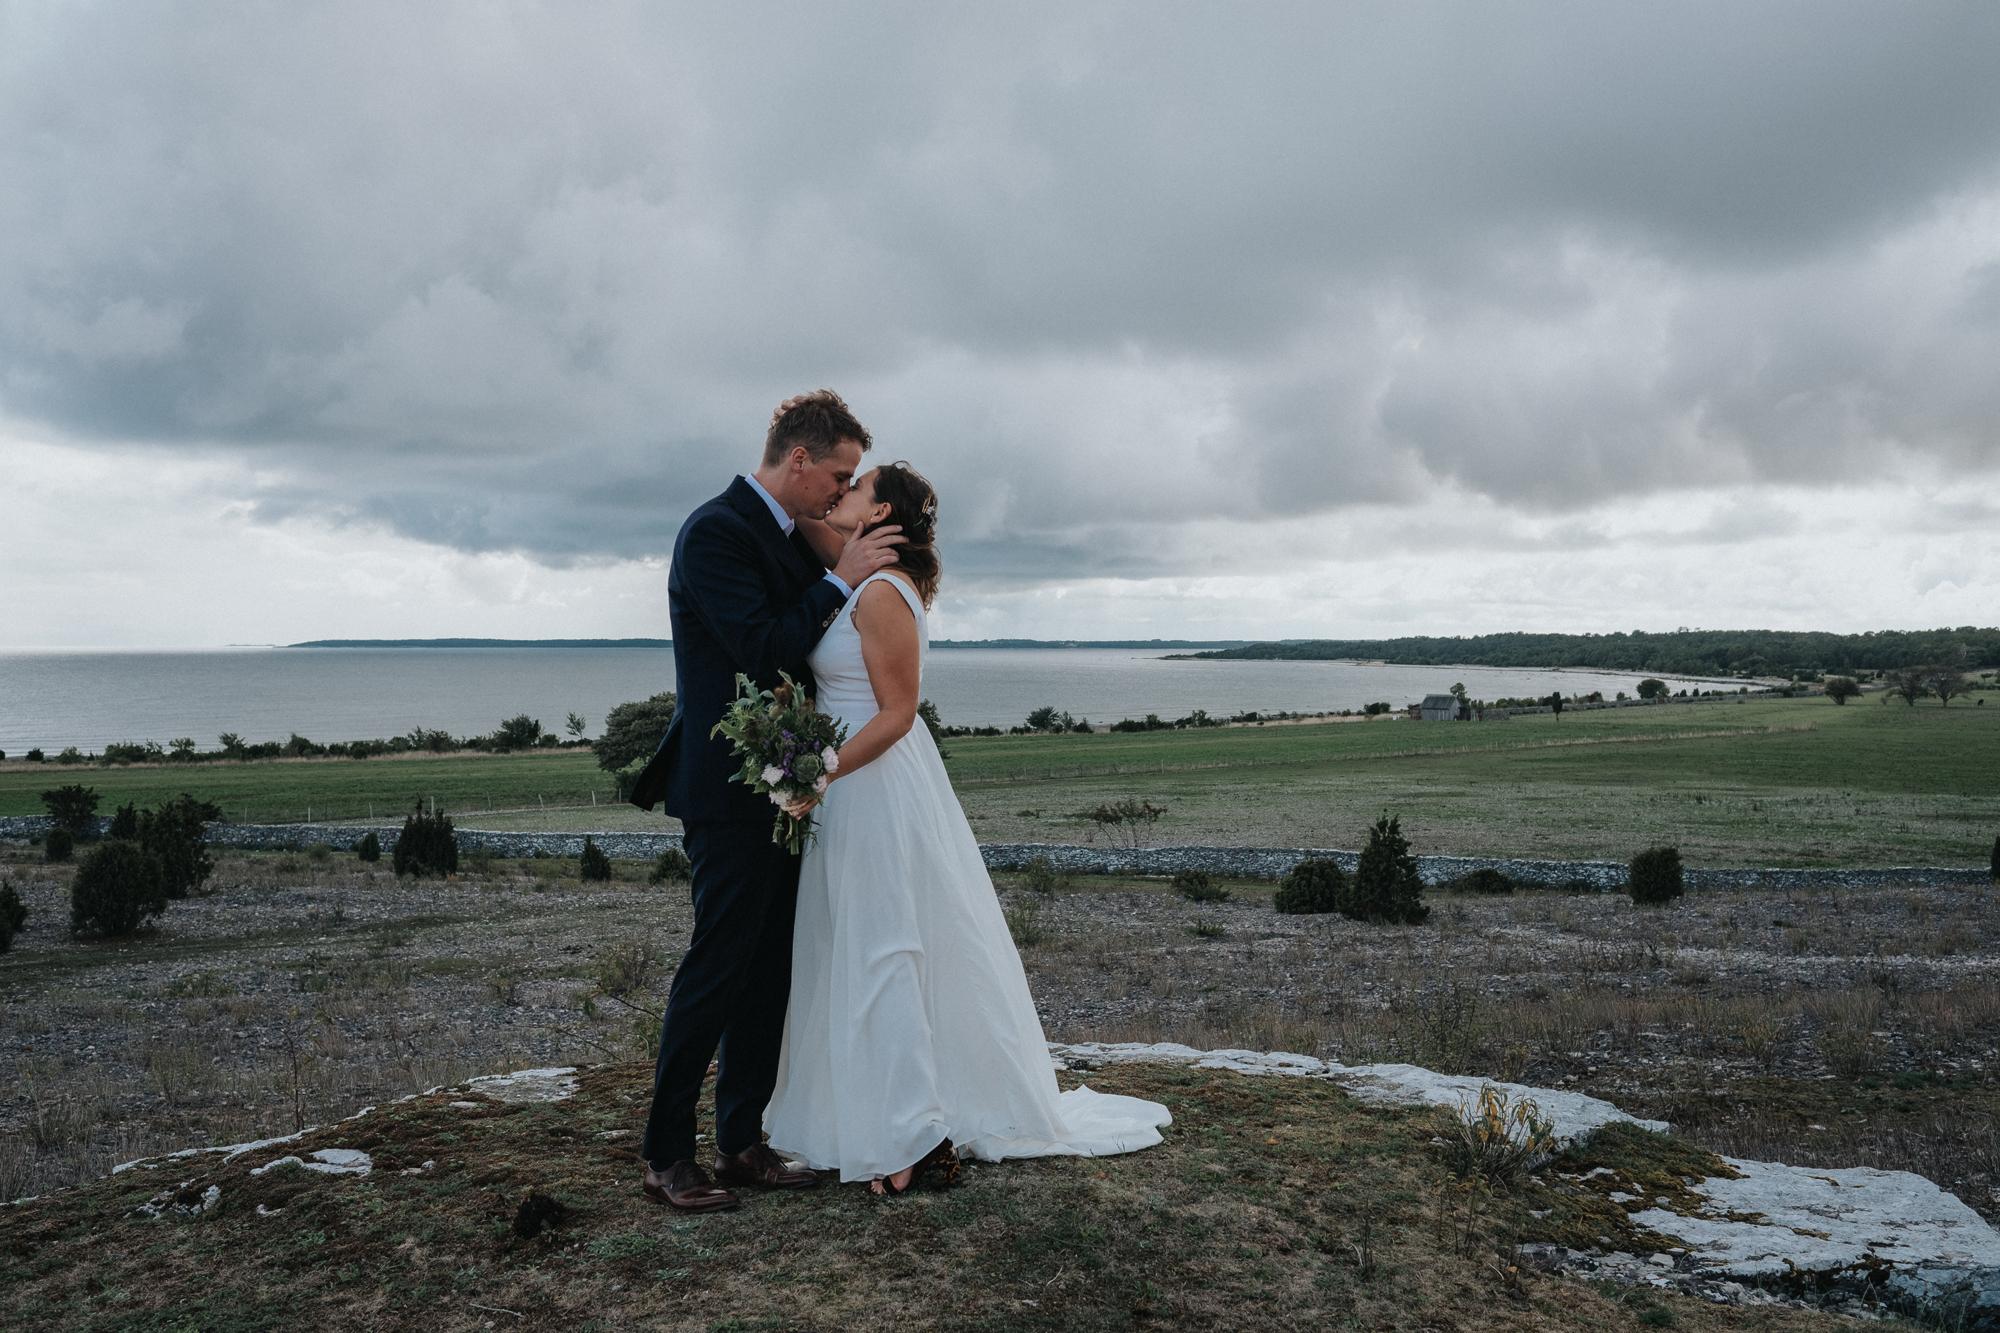 038-bröllopsfotograf-fårö-neas-fotografi.jpg